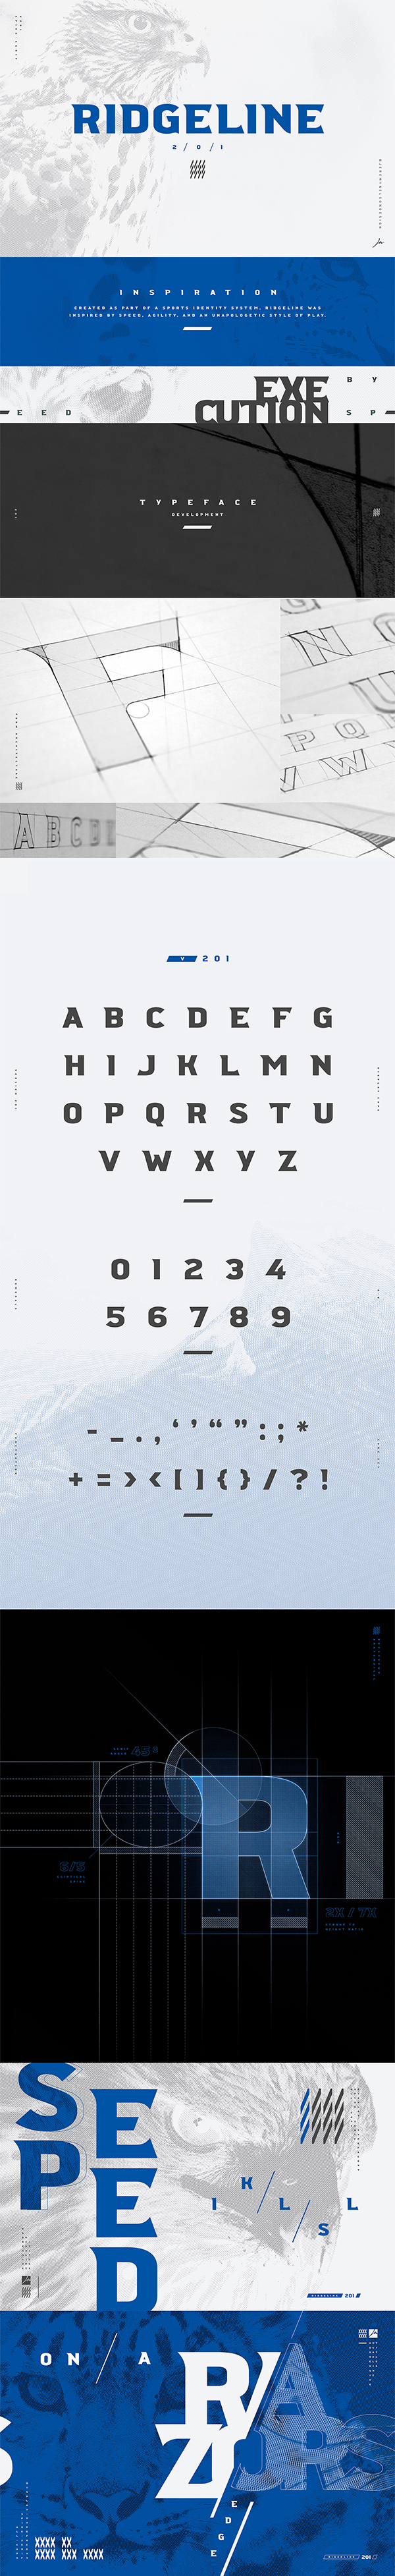 Ridgeline Display Free Font